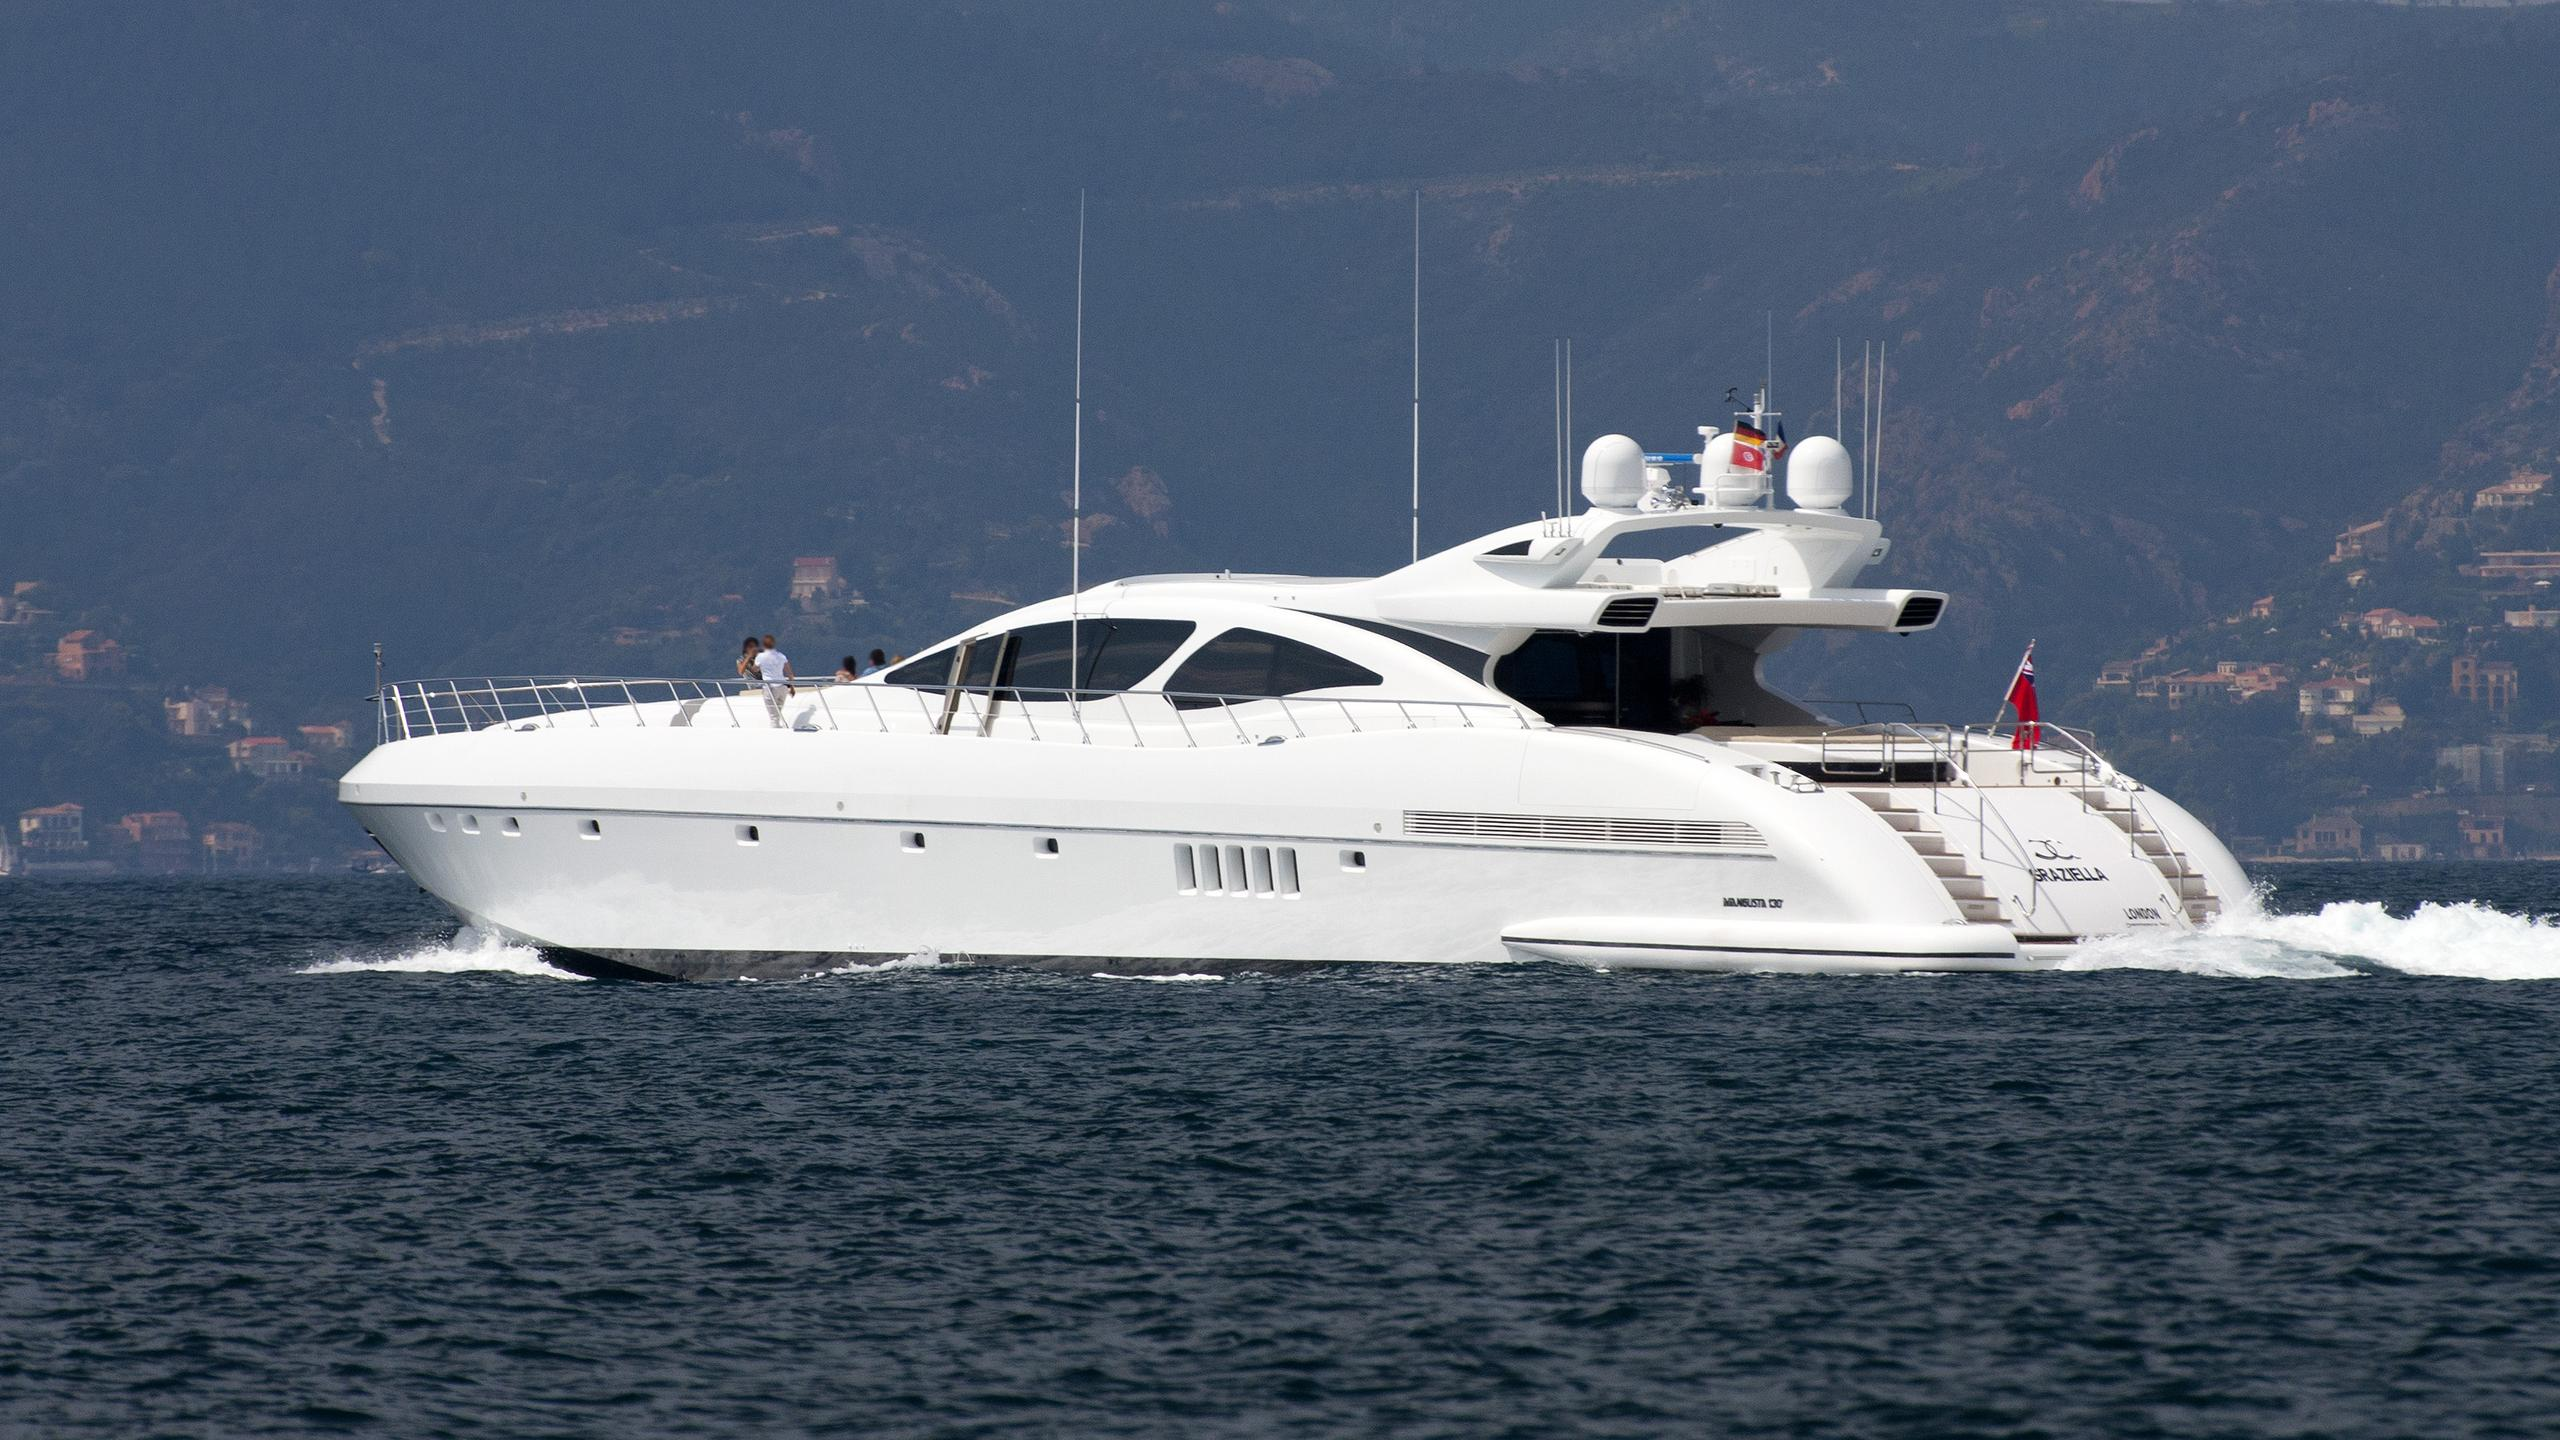 voyage-motor-yacht-Mangusta-130-Sport-2006-39m-cruising